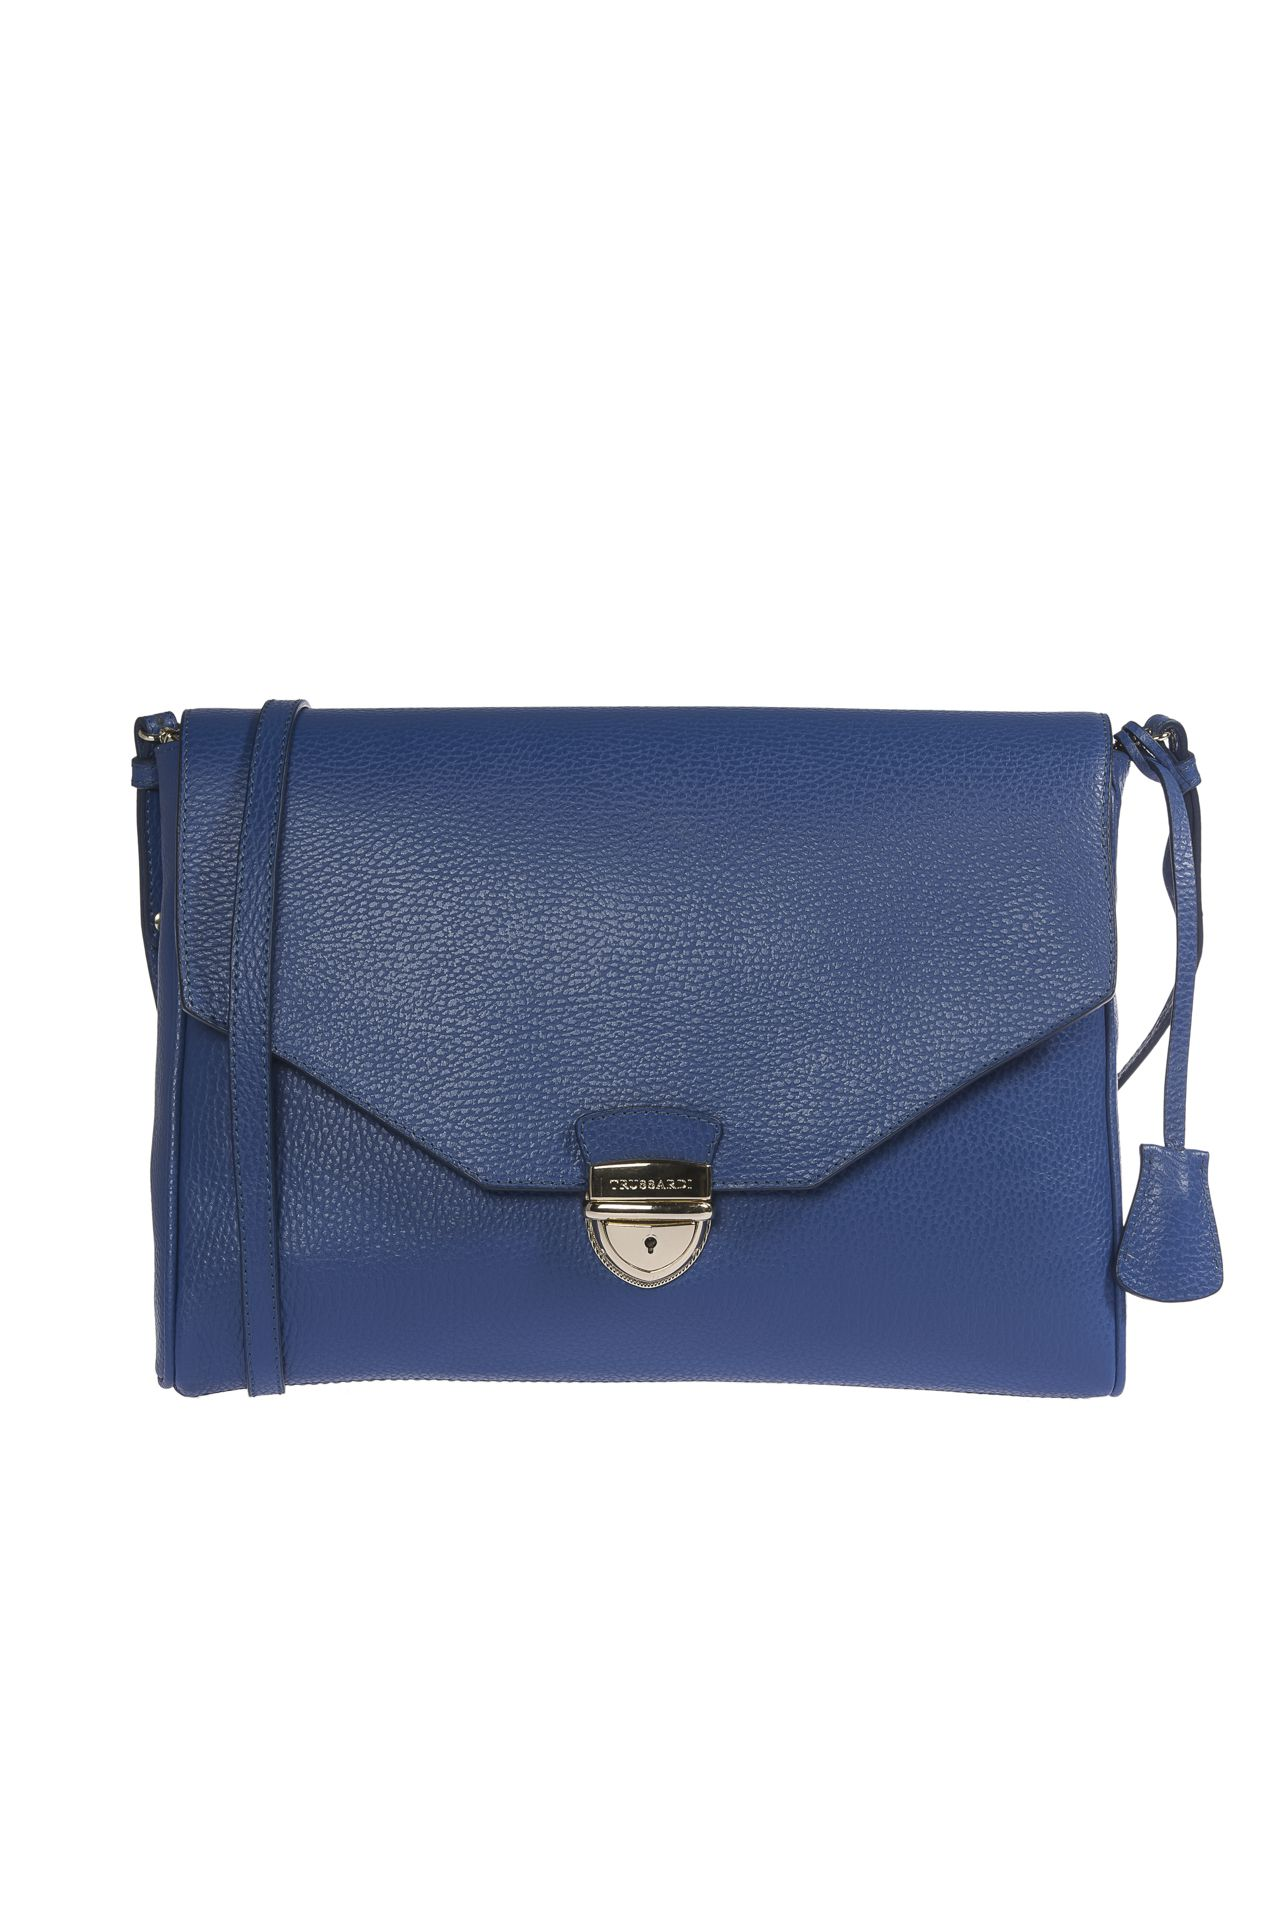 Trussardi Women's Crossbody Bag Brown 1DB435_49Blue